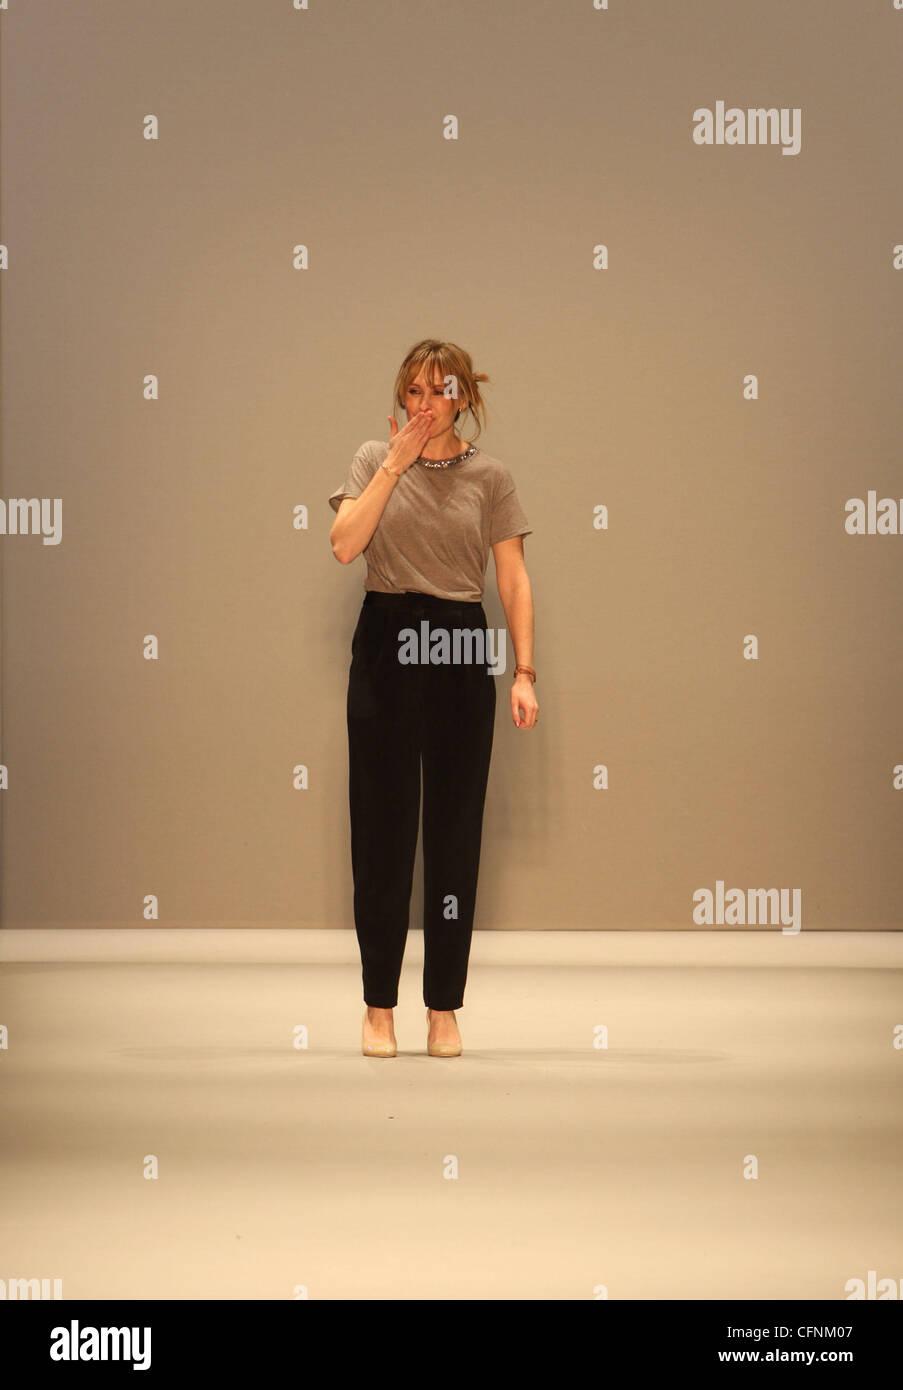 Designer Rebecca Taylor Mercedes Benz Img New York Fashion Week Fall Stock Photo 44117255 Alamy